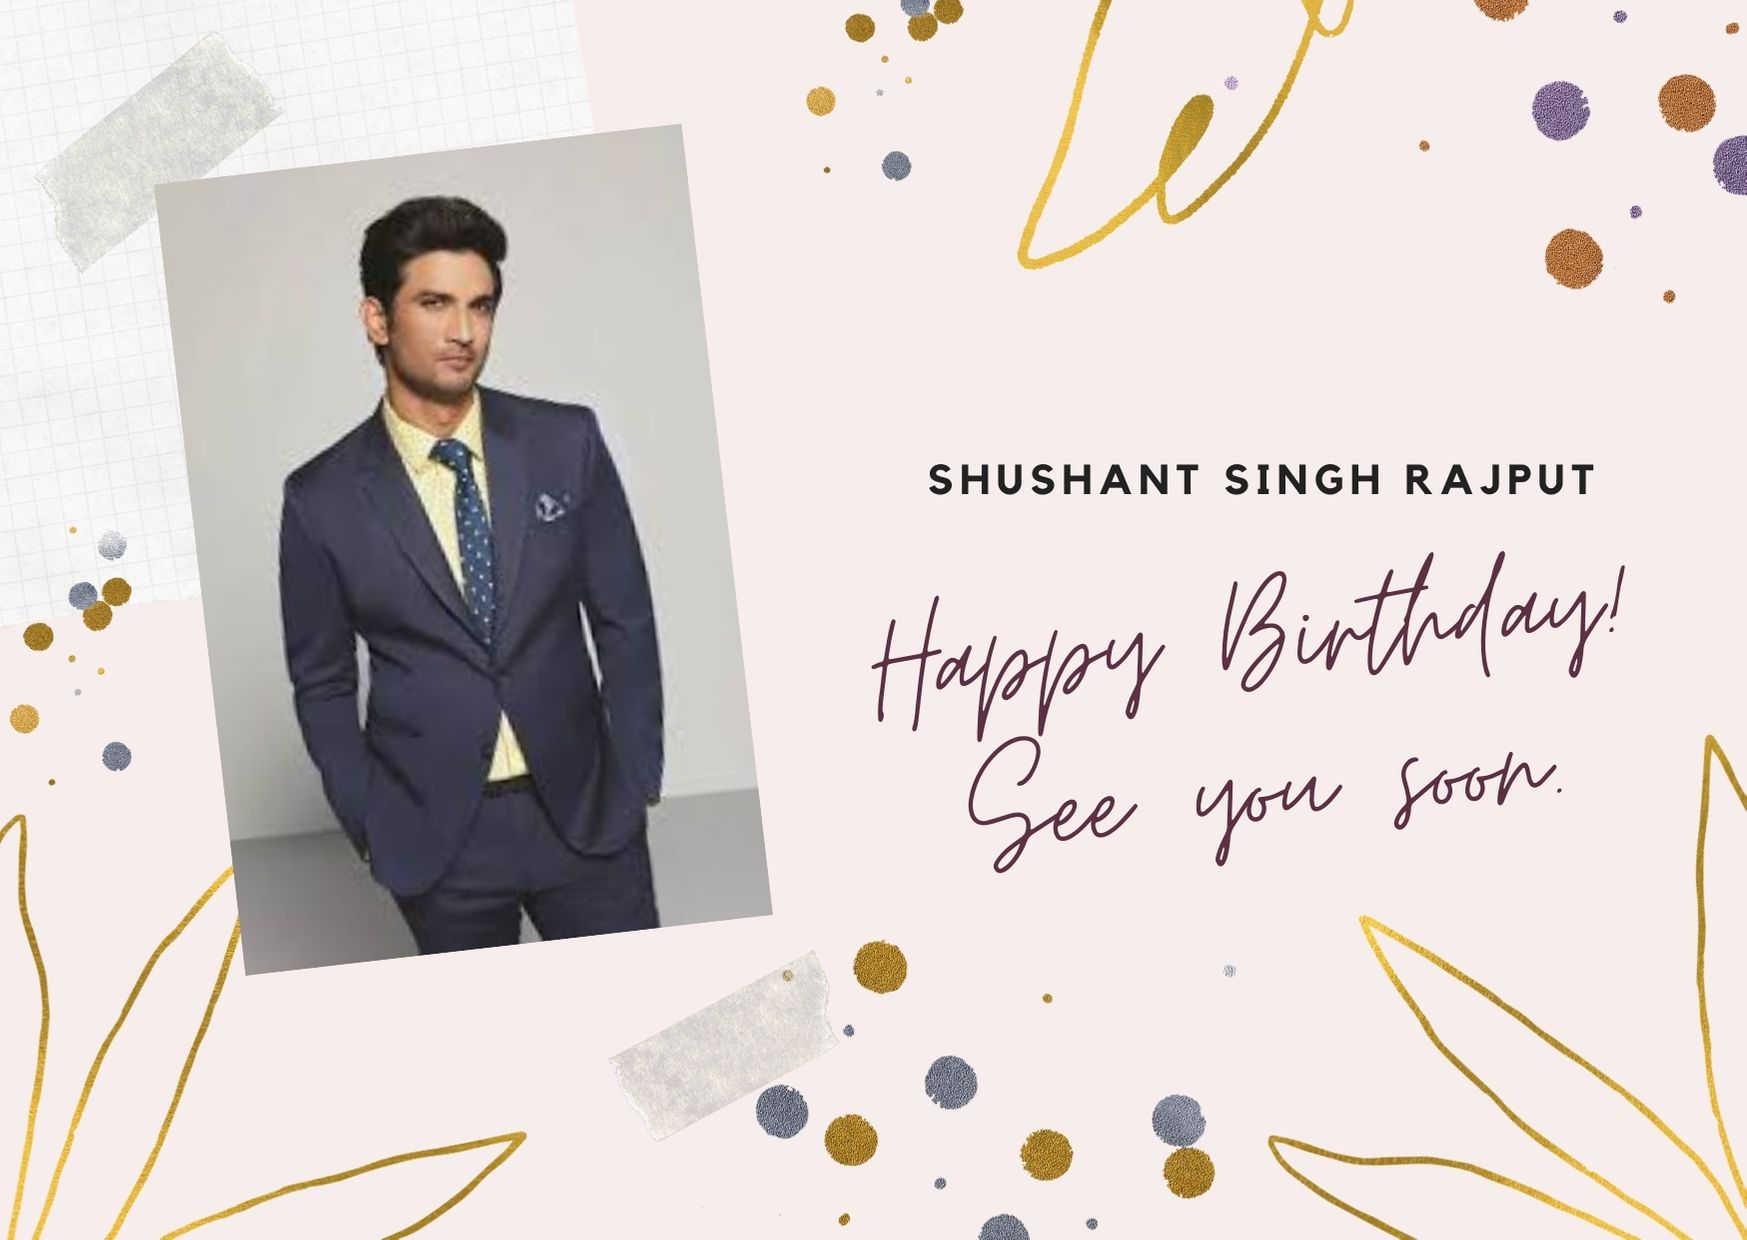 Shushant singh rajput birthday